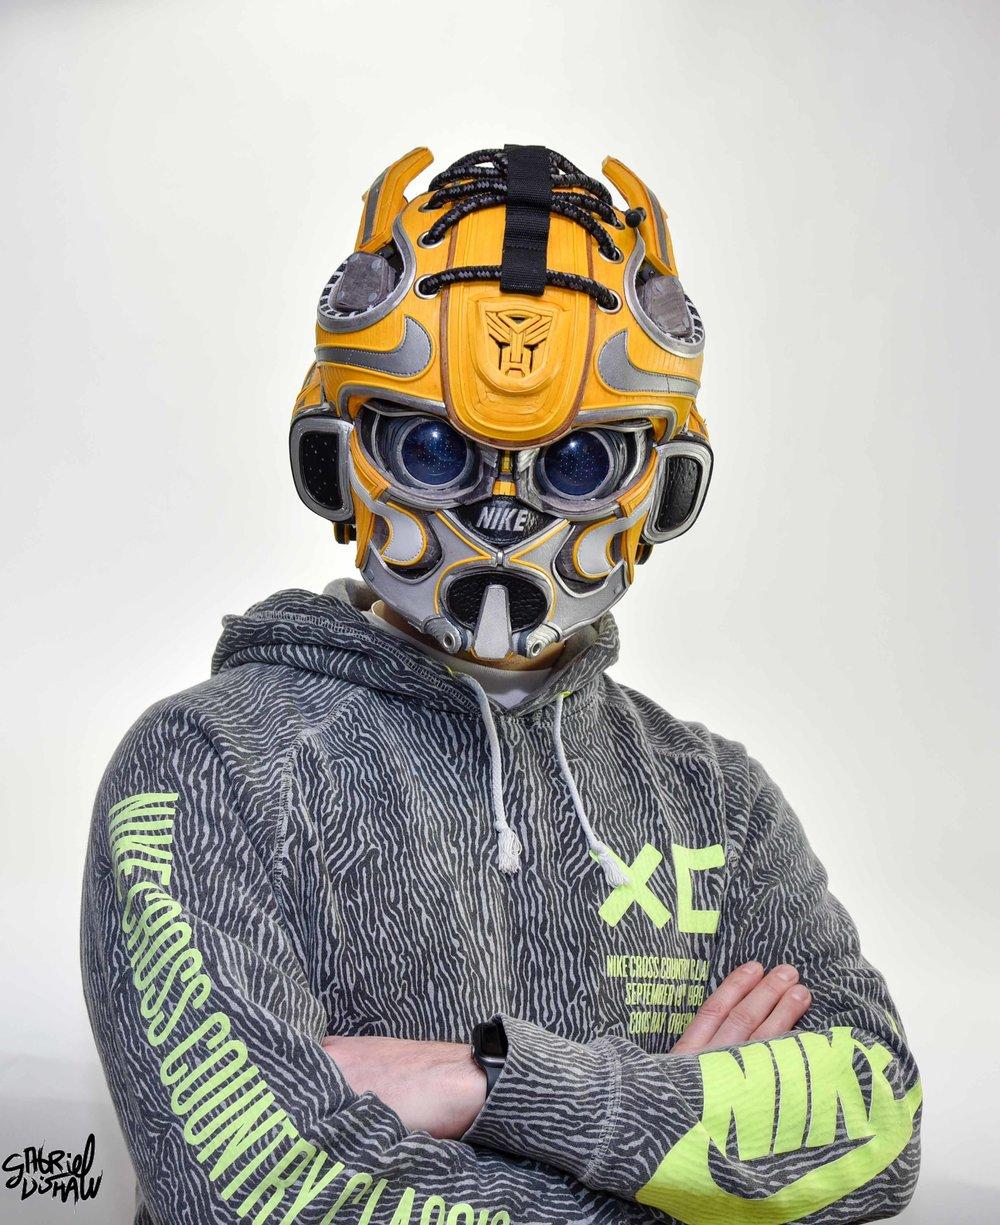 Gabriel Dishaw Bumblebee Swoosh-8704.jpg